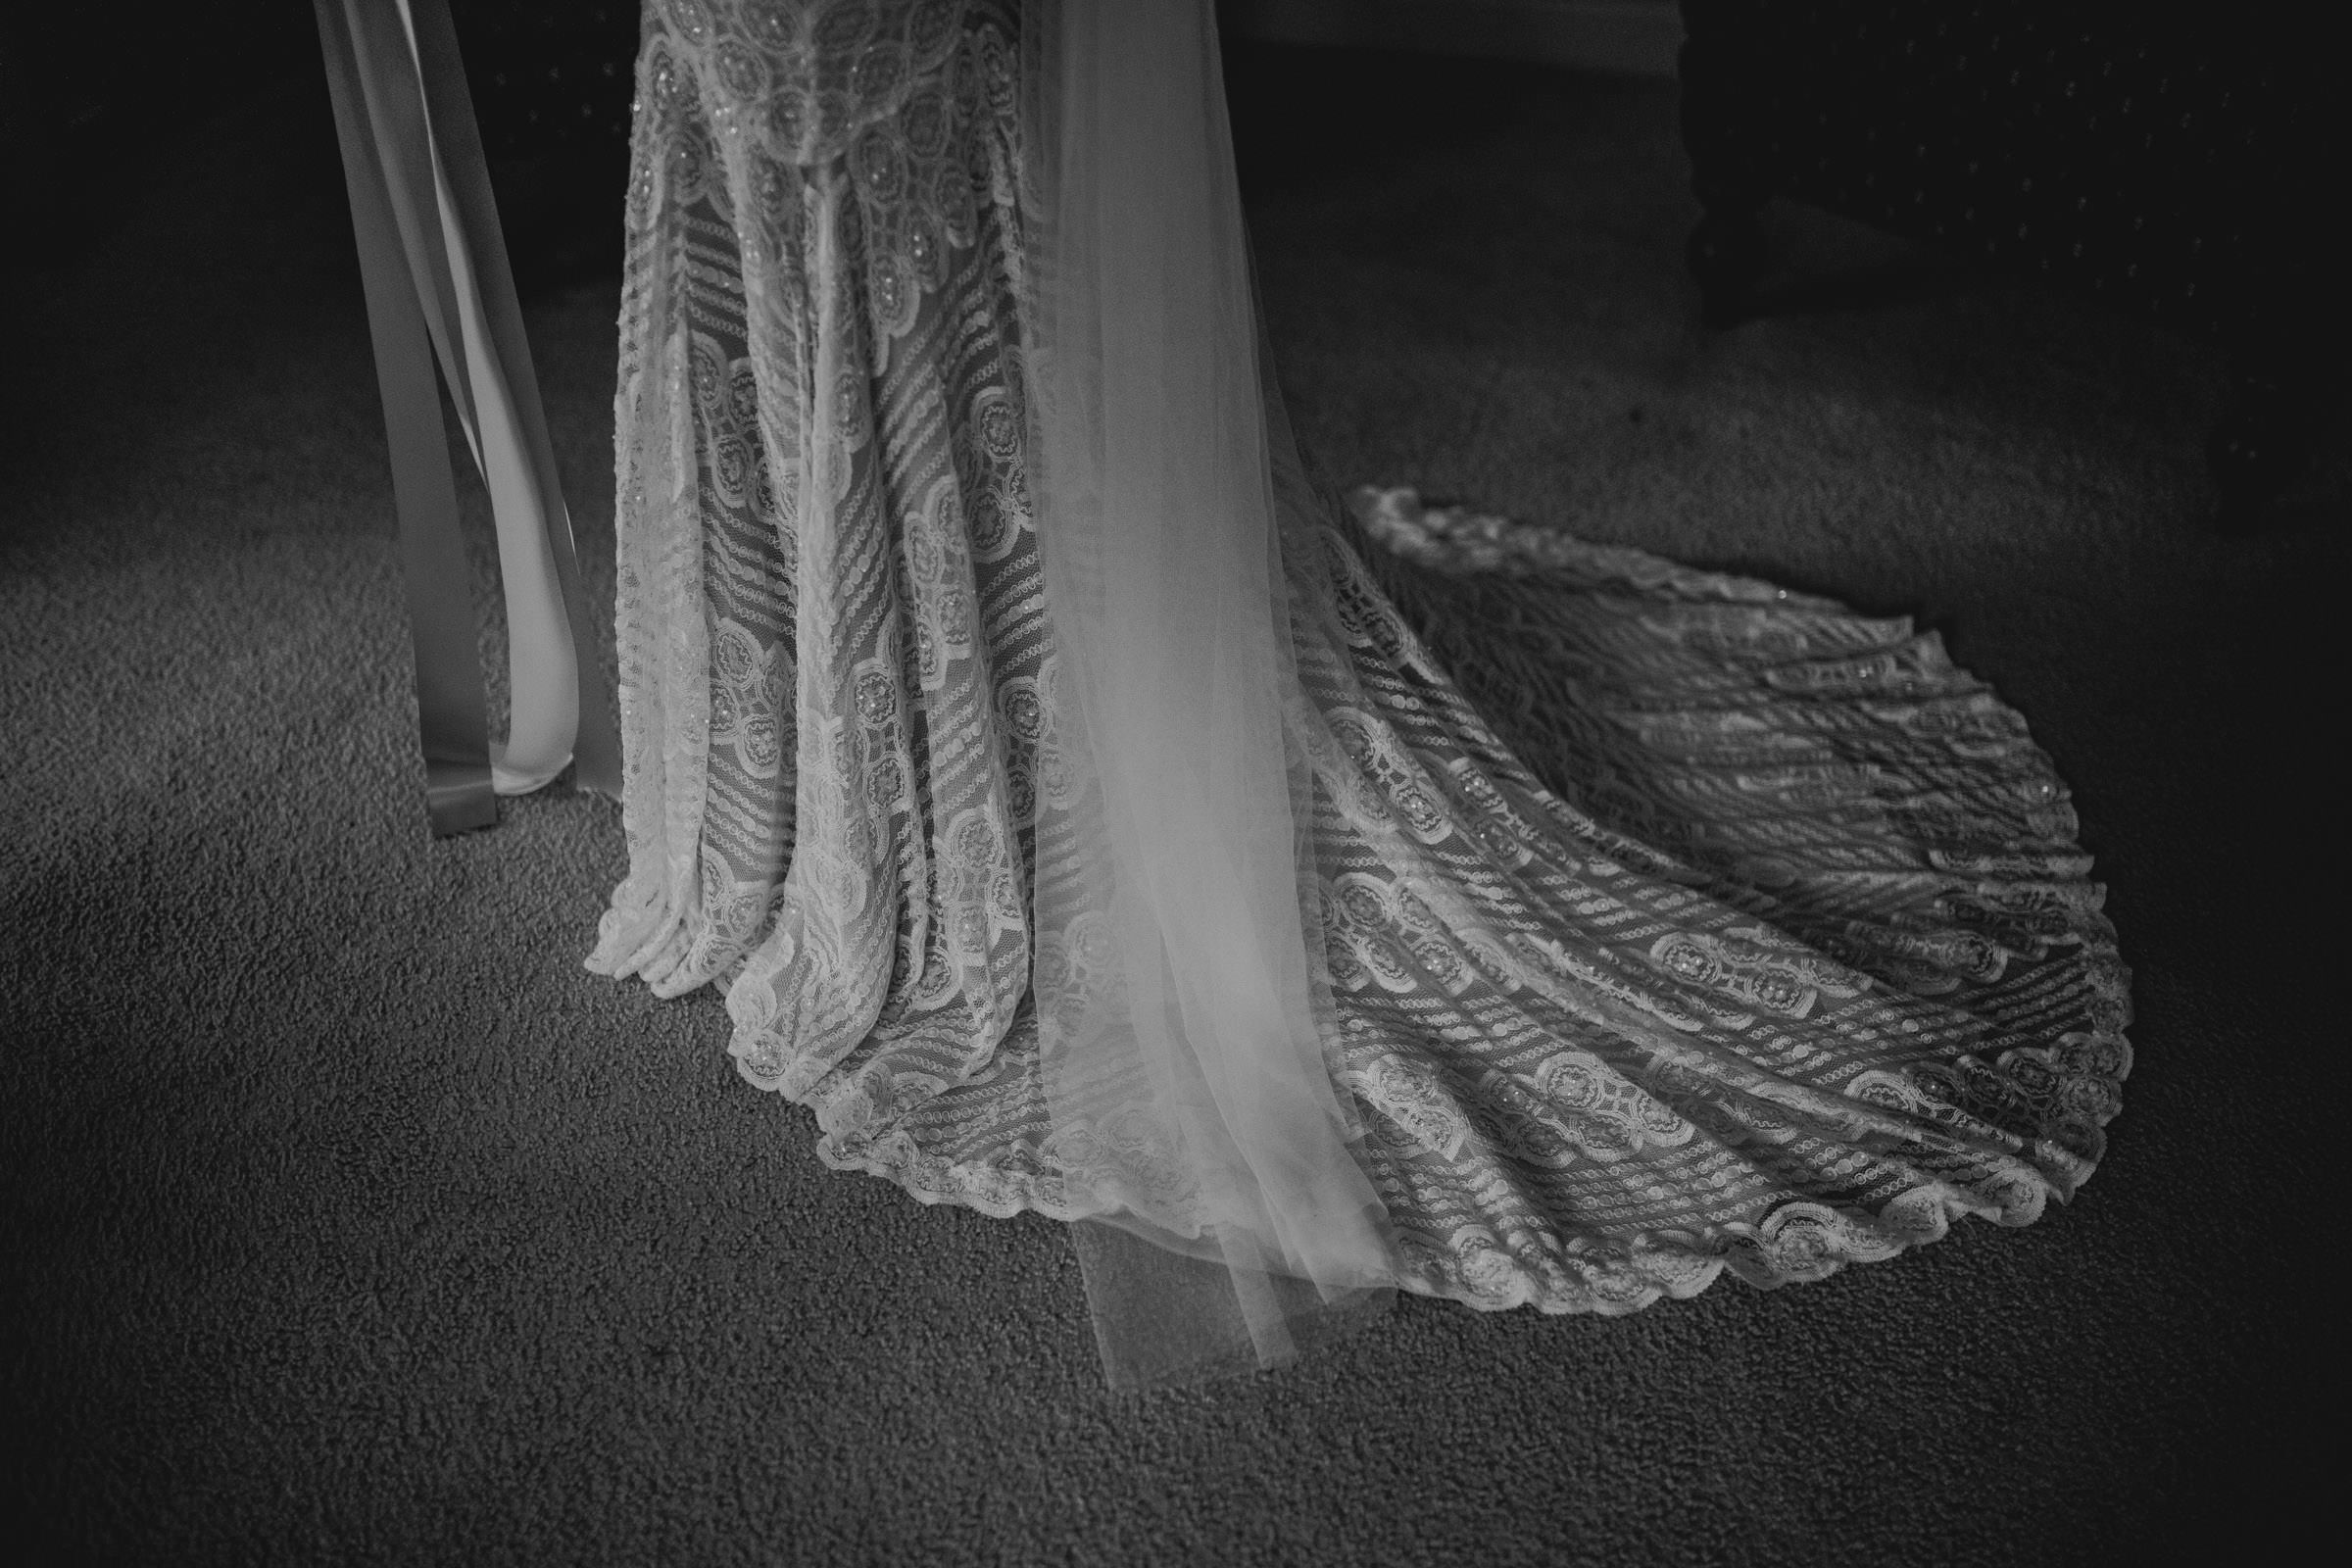 Emma+John+Far+South+Coast+Wedding+Festivl+Glamping+Bush-55.jpg